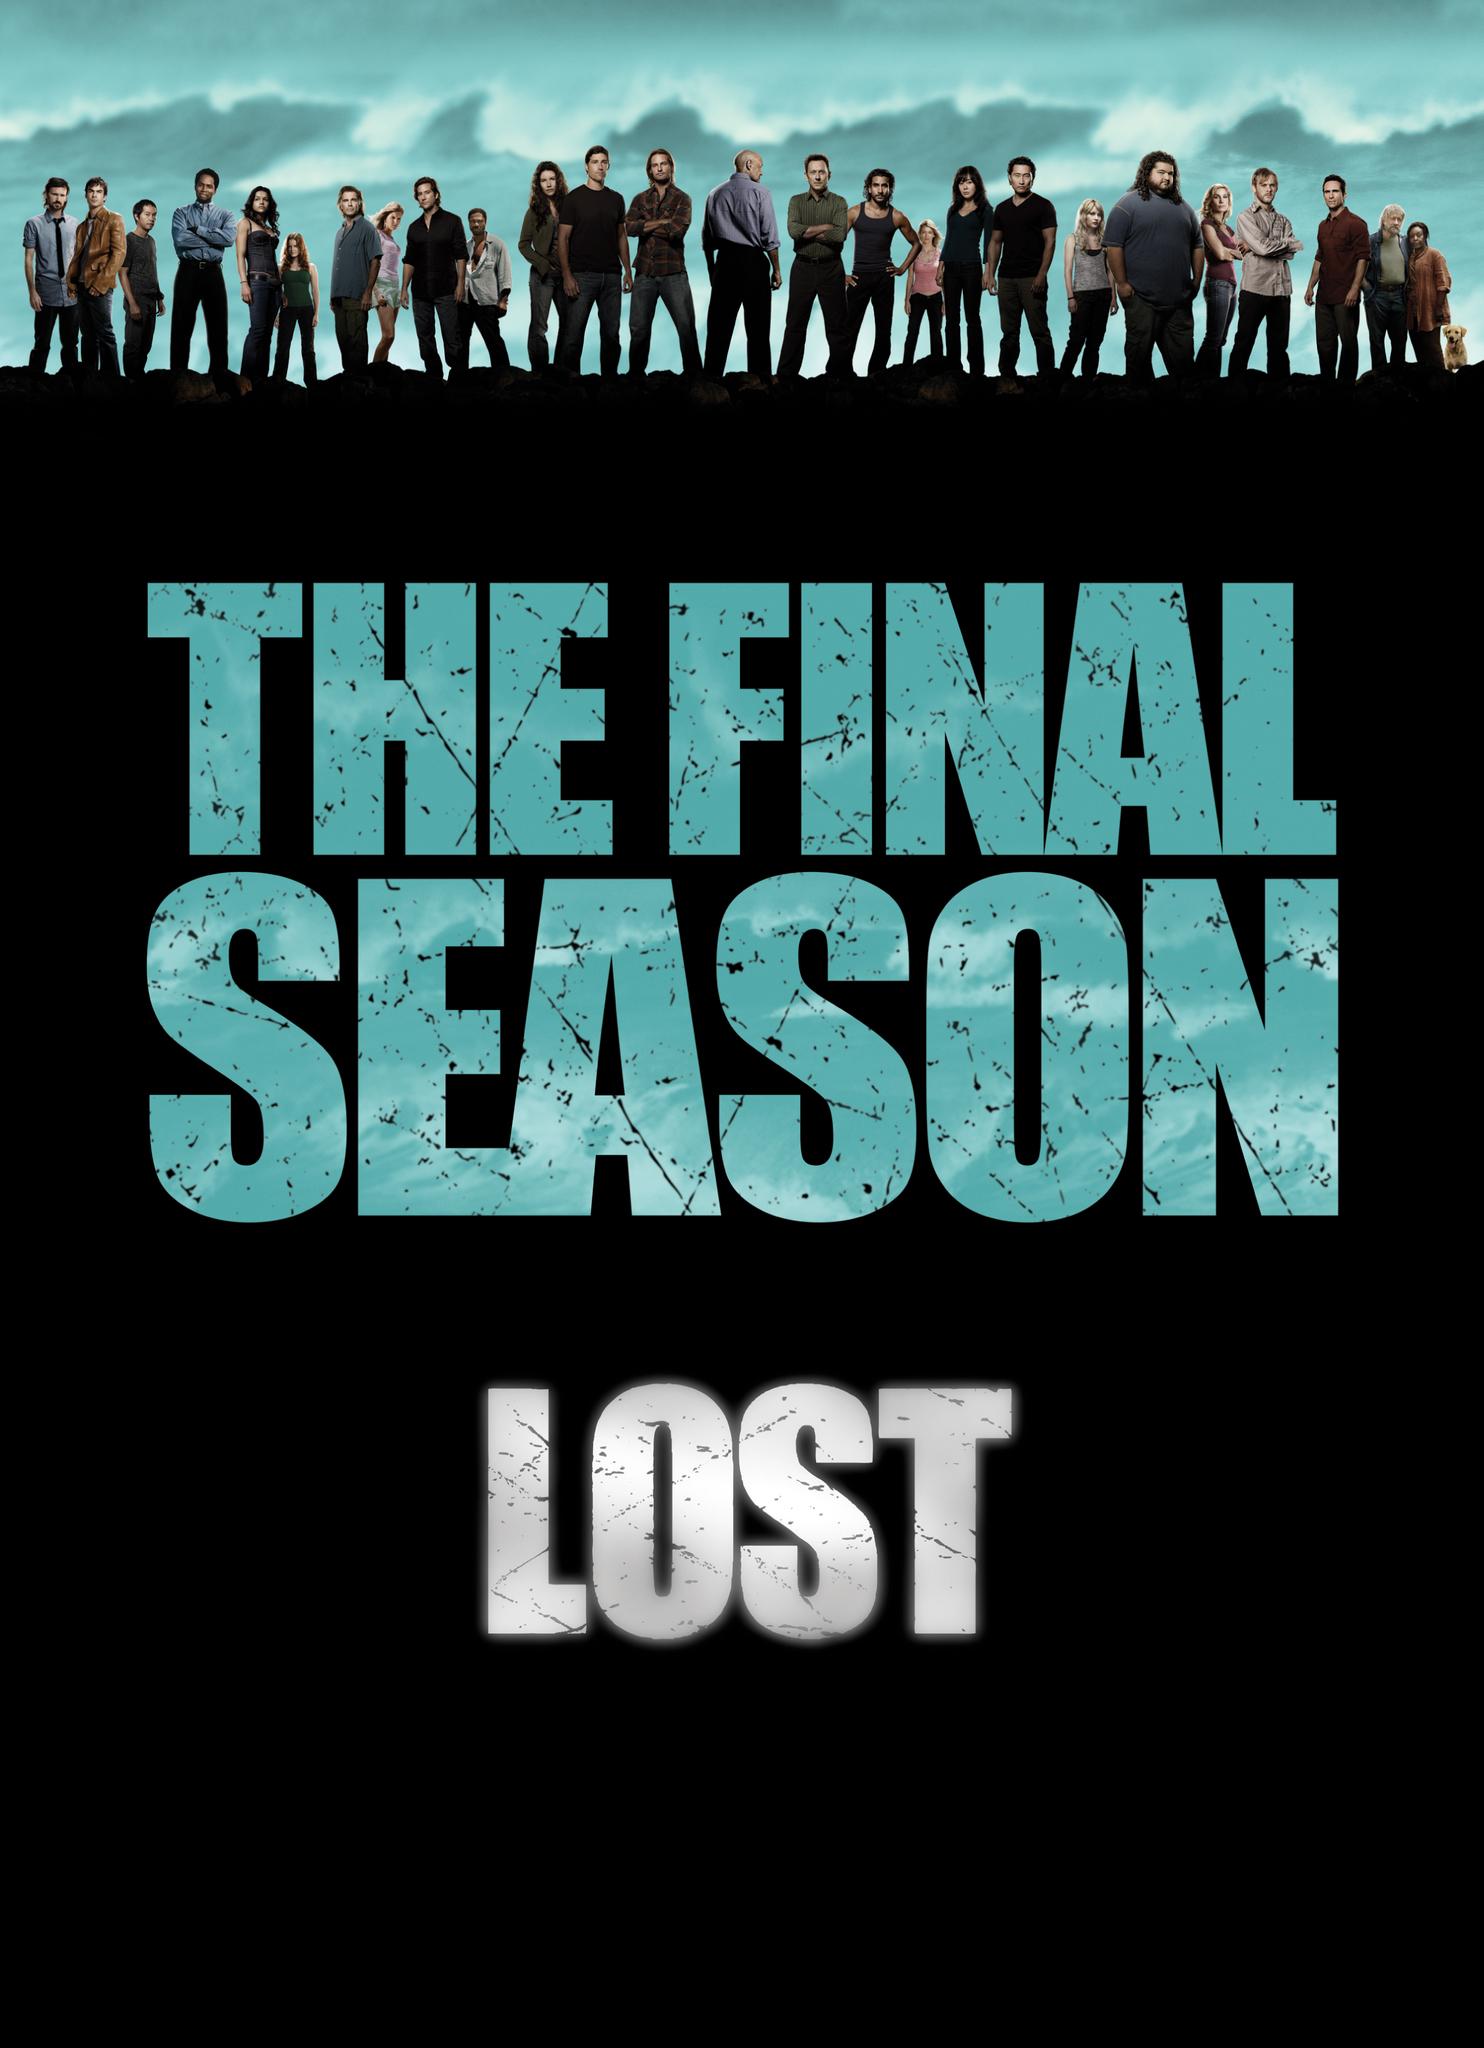 LostSeason6OfficialPoster.jpg